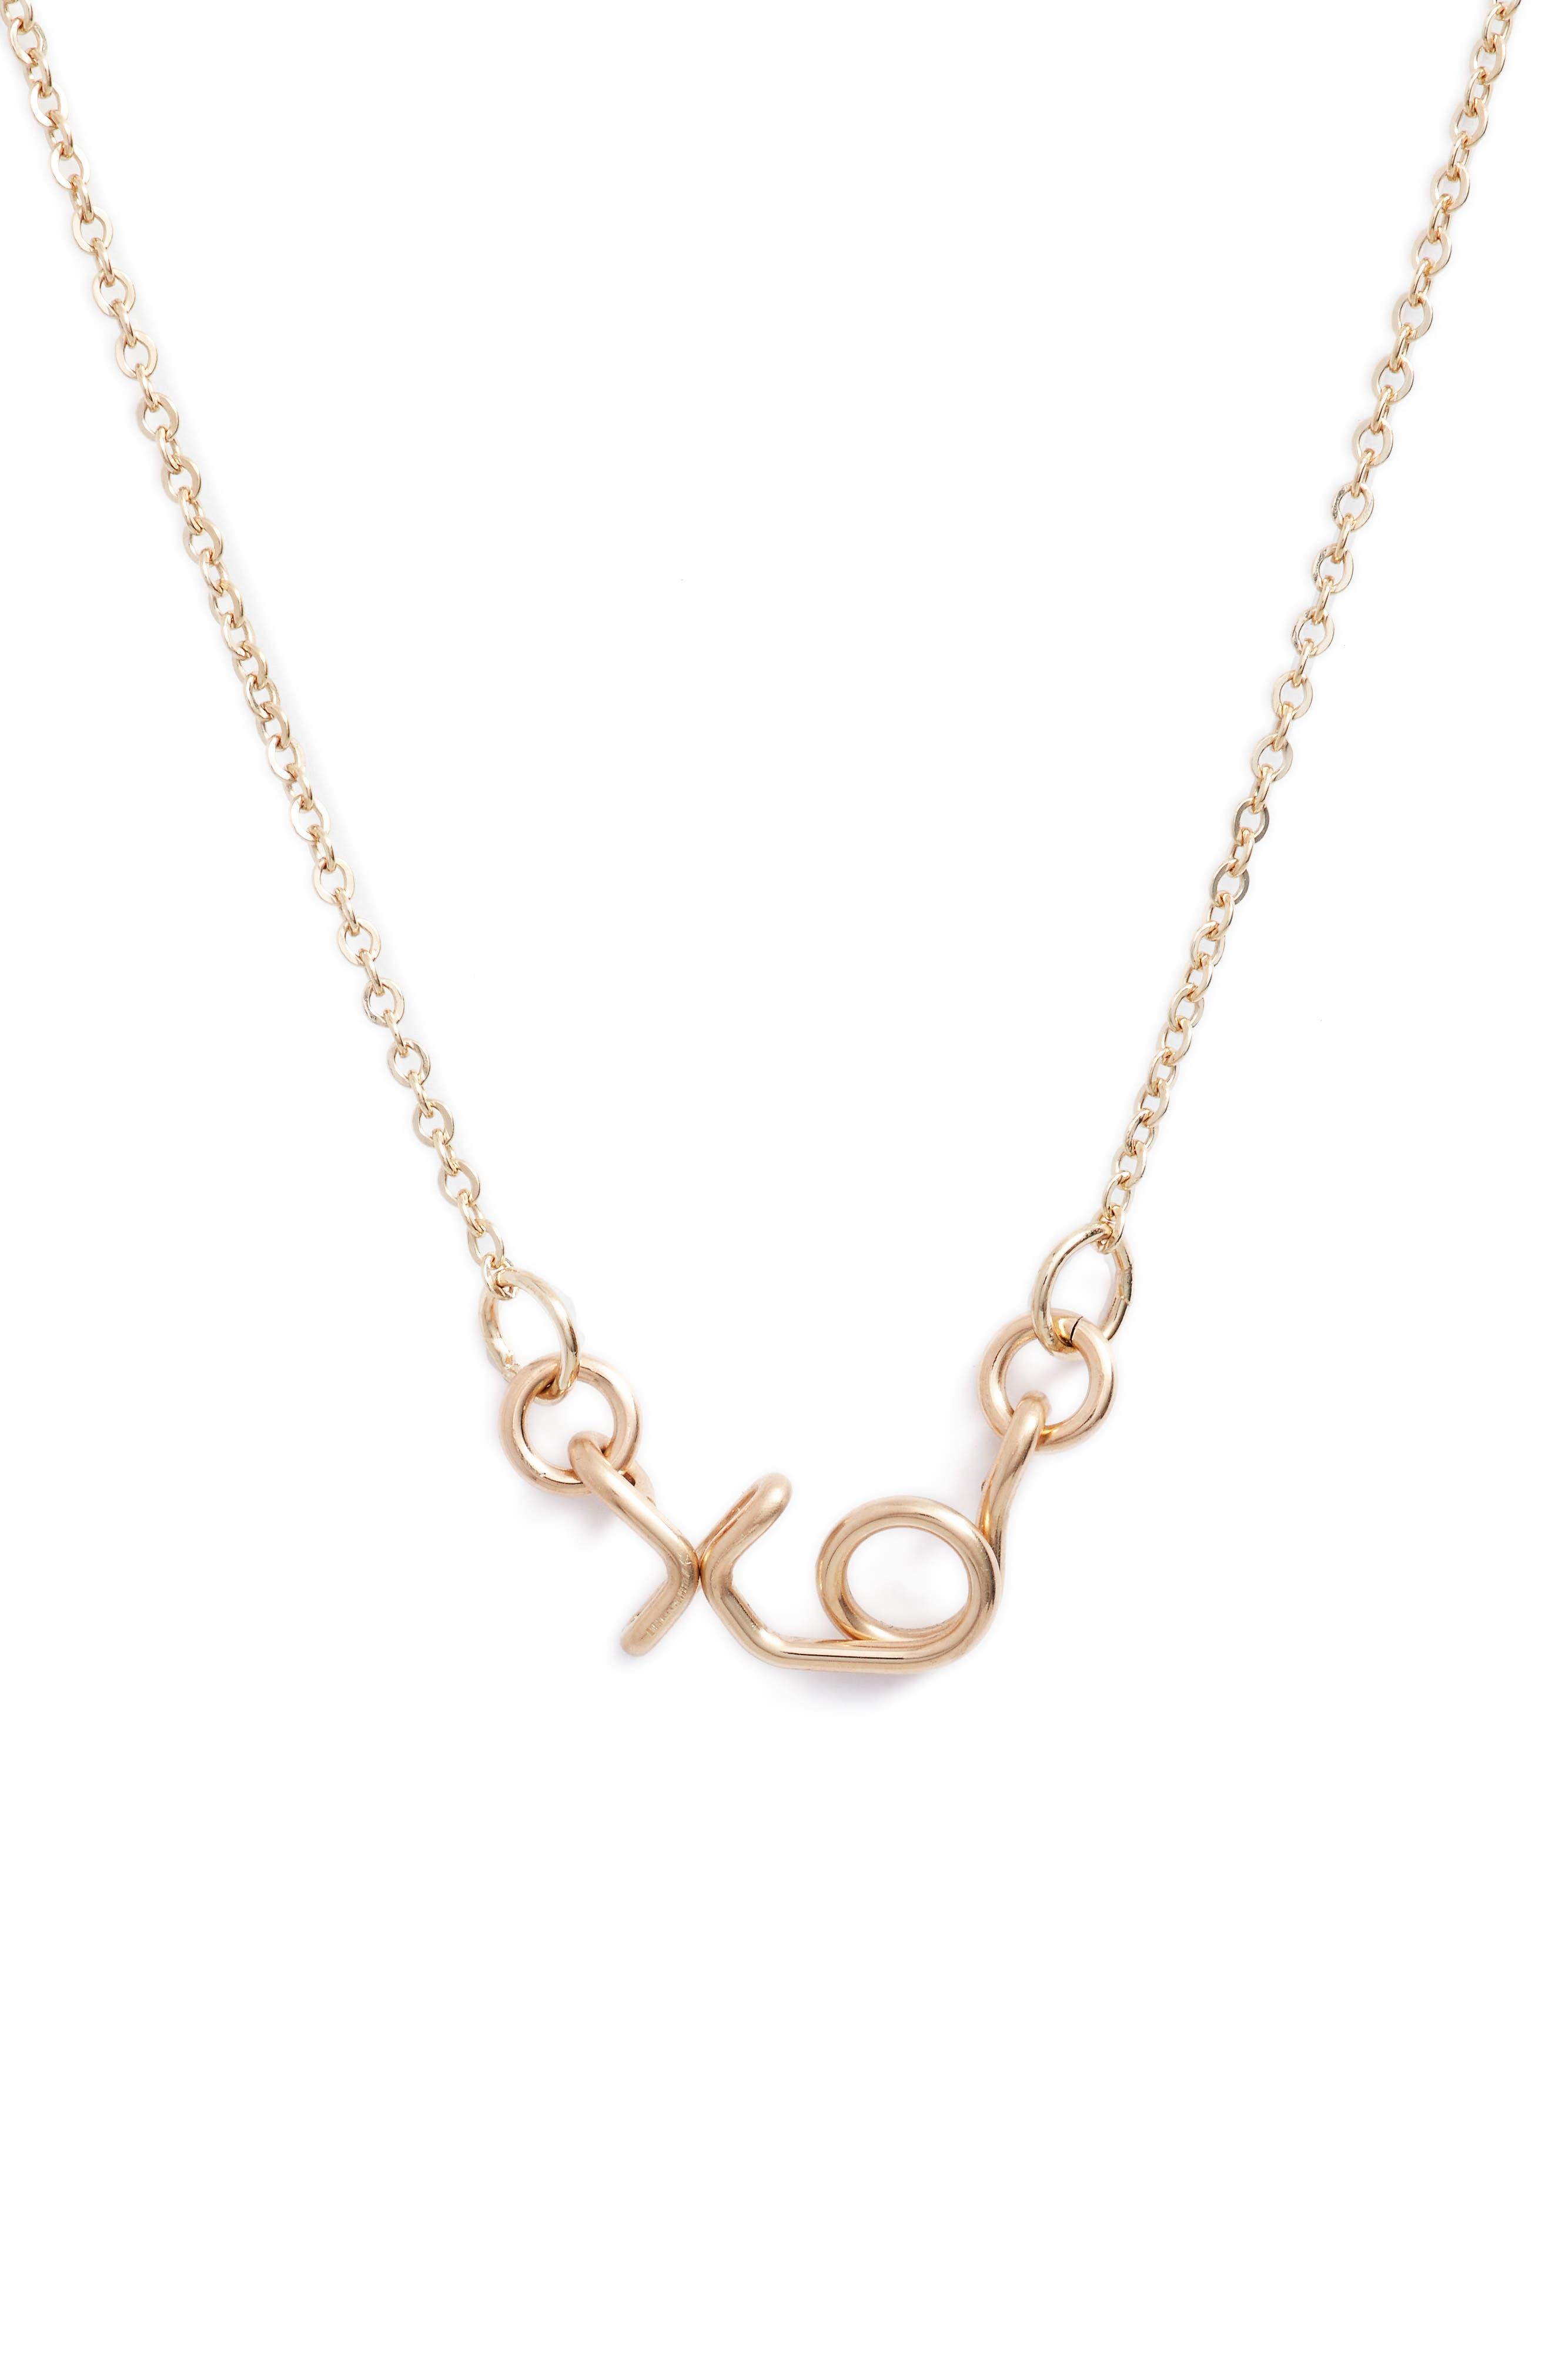 NASHELLE Mini XO Pendant Necklace